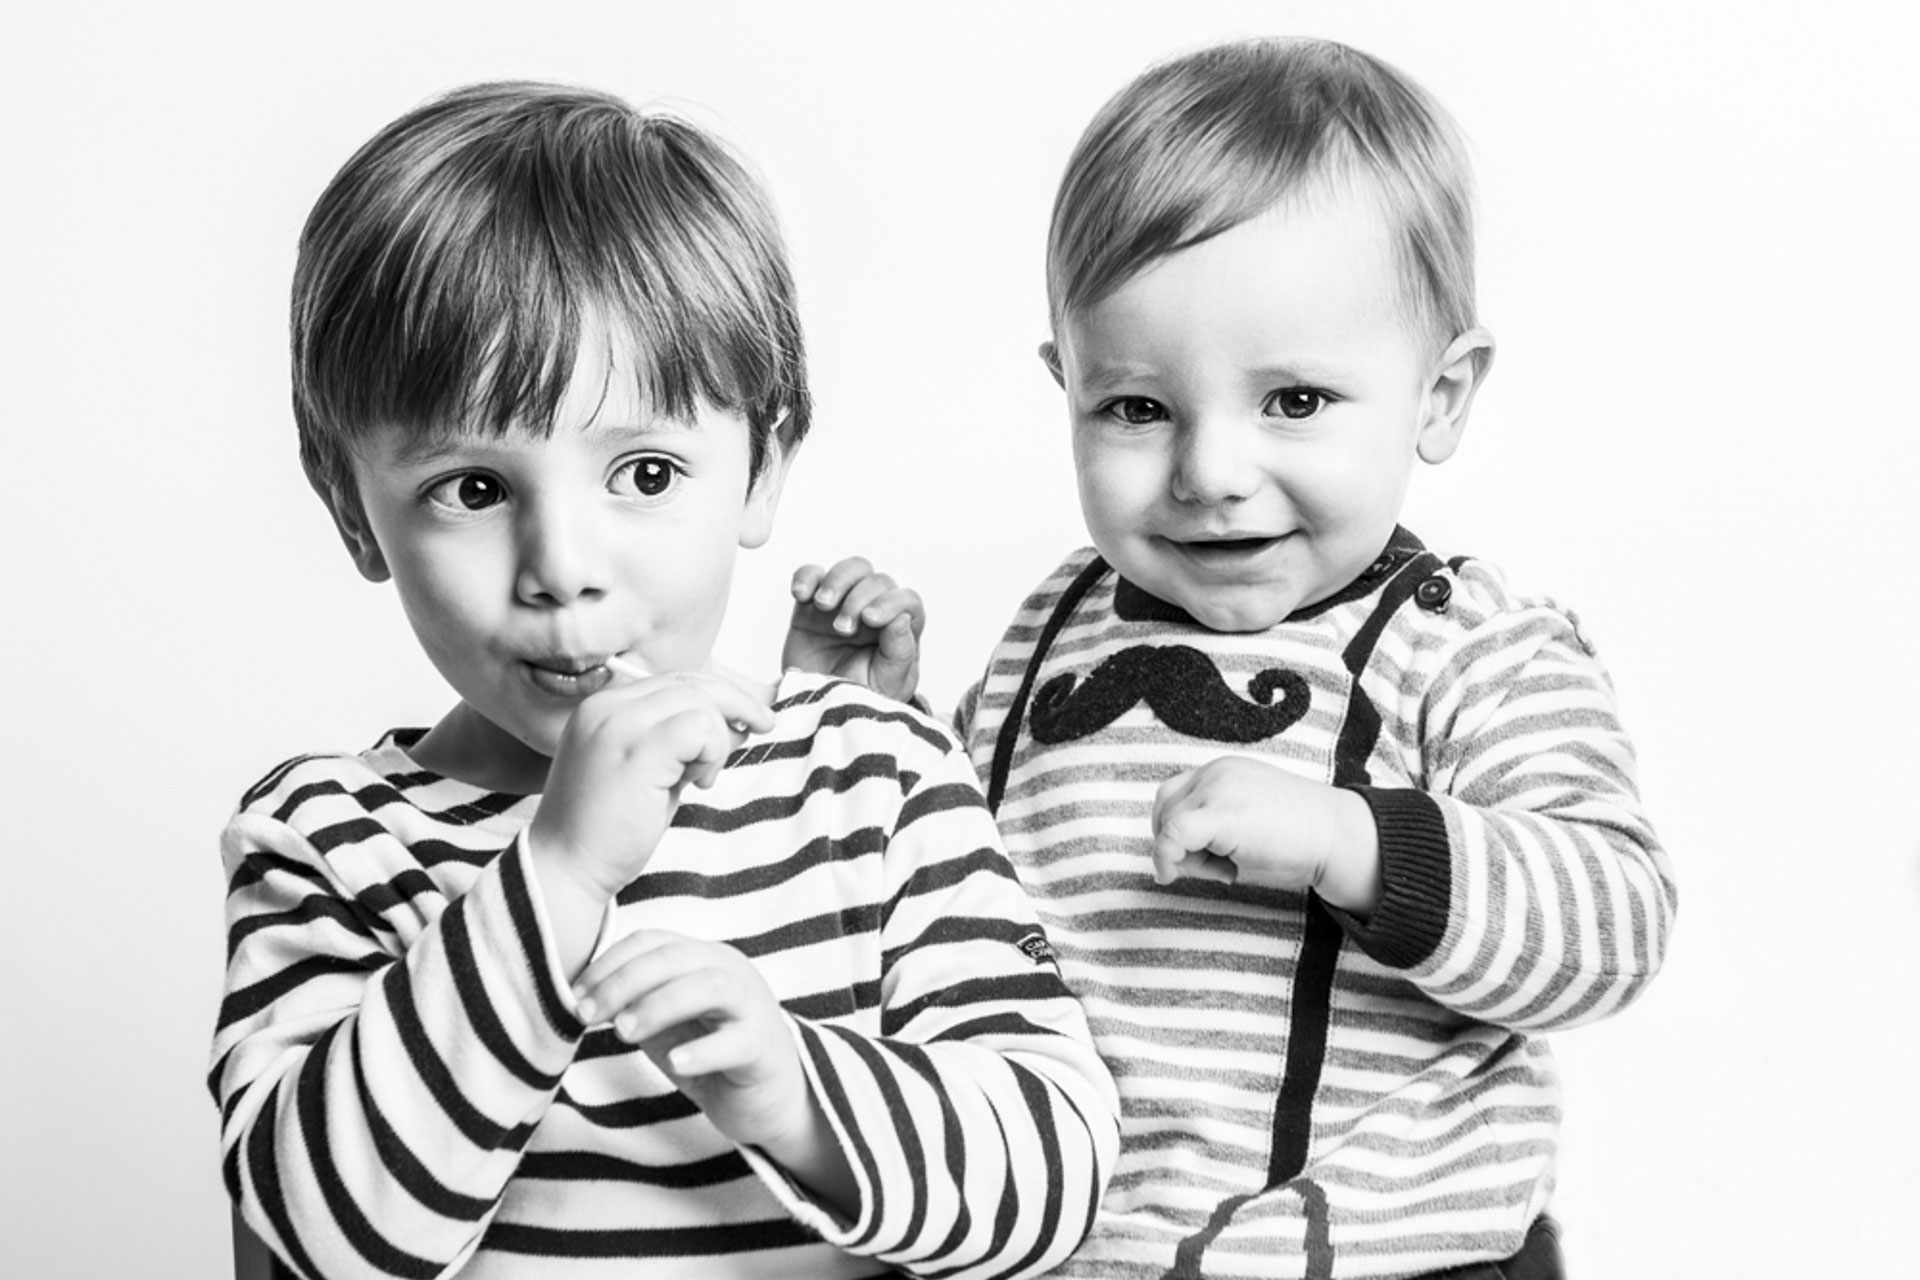 050 familia fotografia murcia infantil lacamararoja LCR pekessonia family MG 0228 001 001